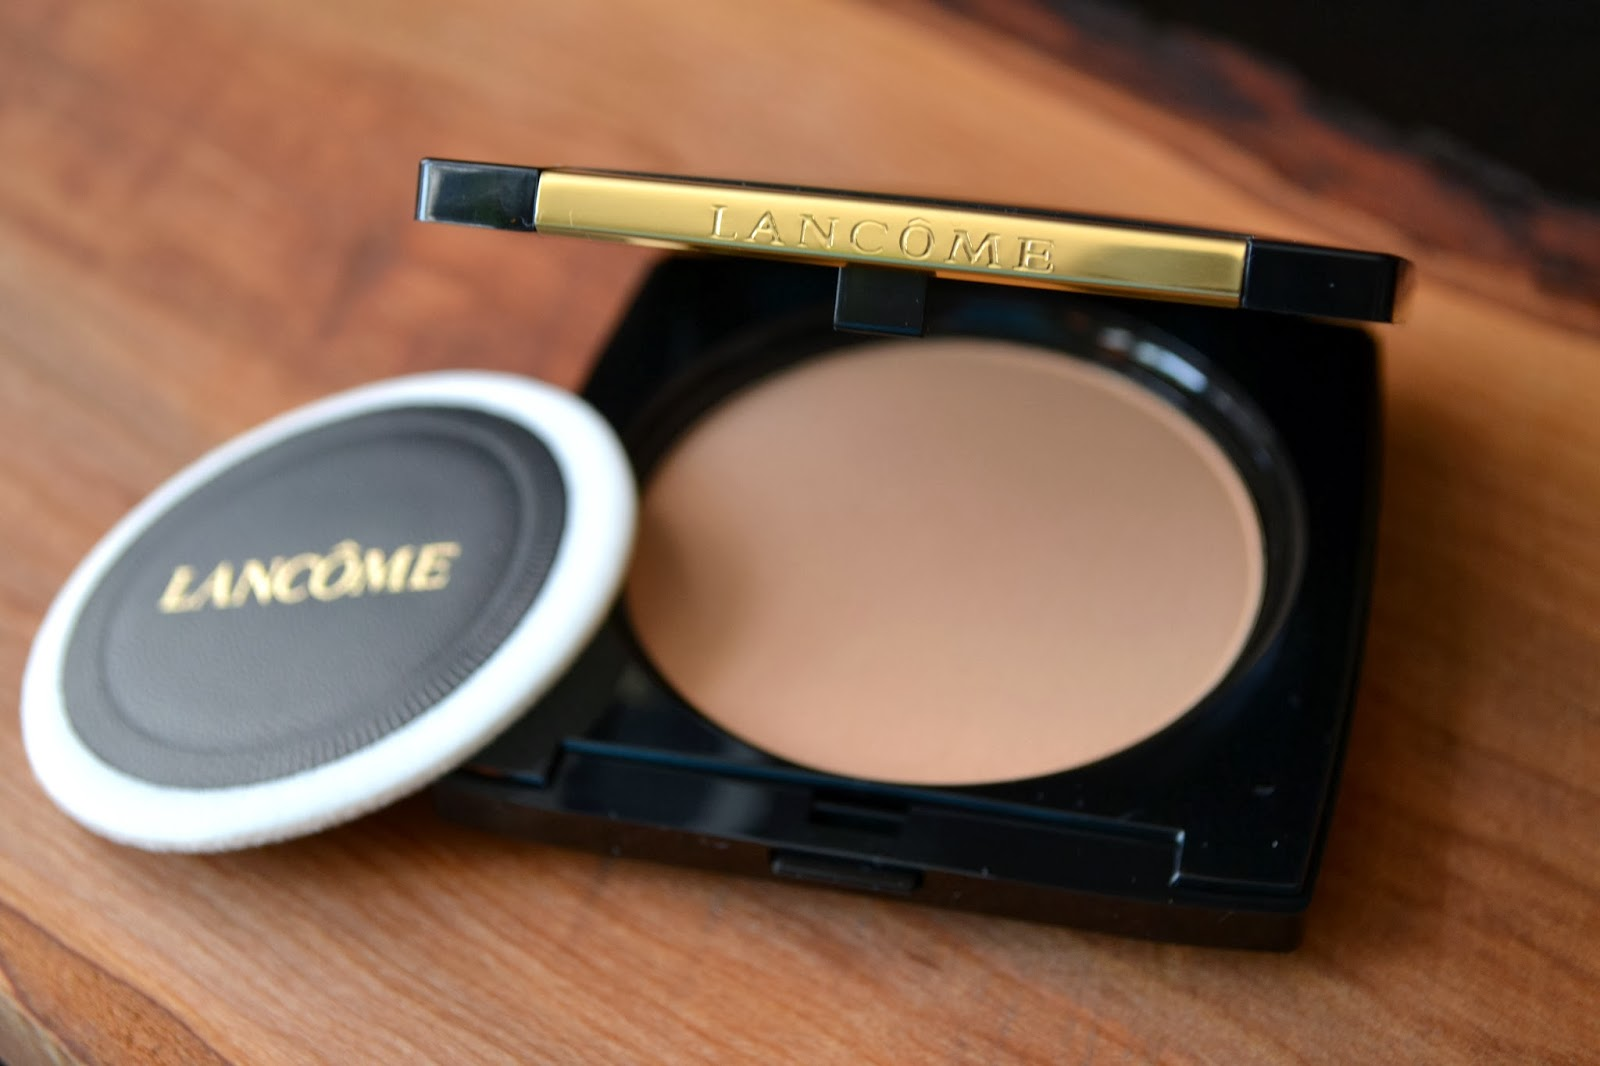 The Staycationer: Lancome | Dual Finish Versatile Powder